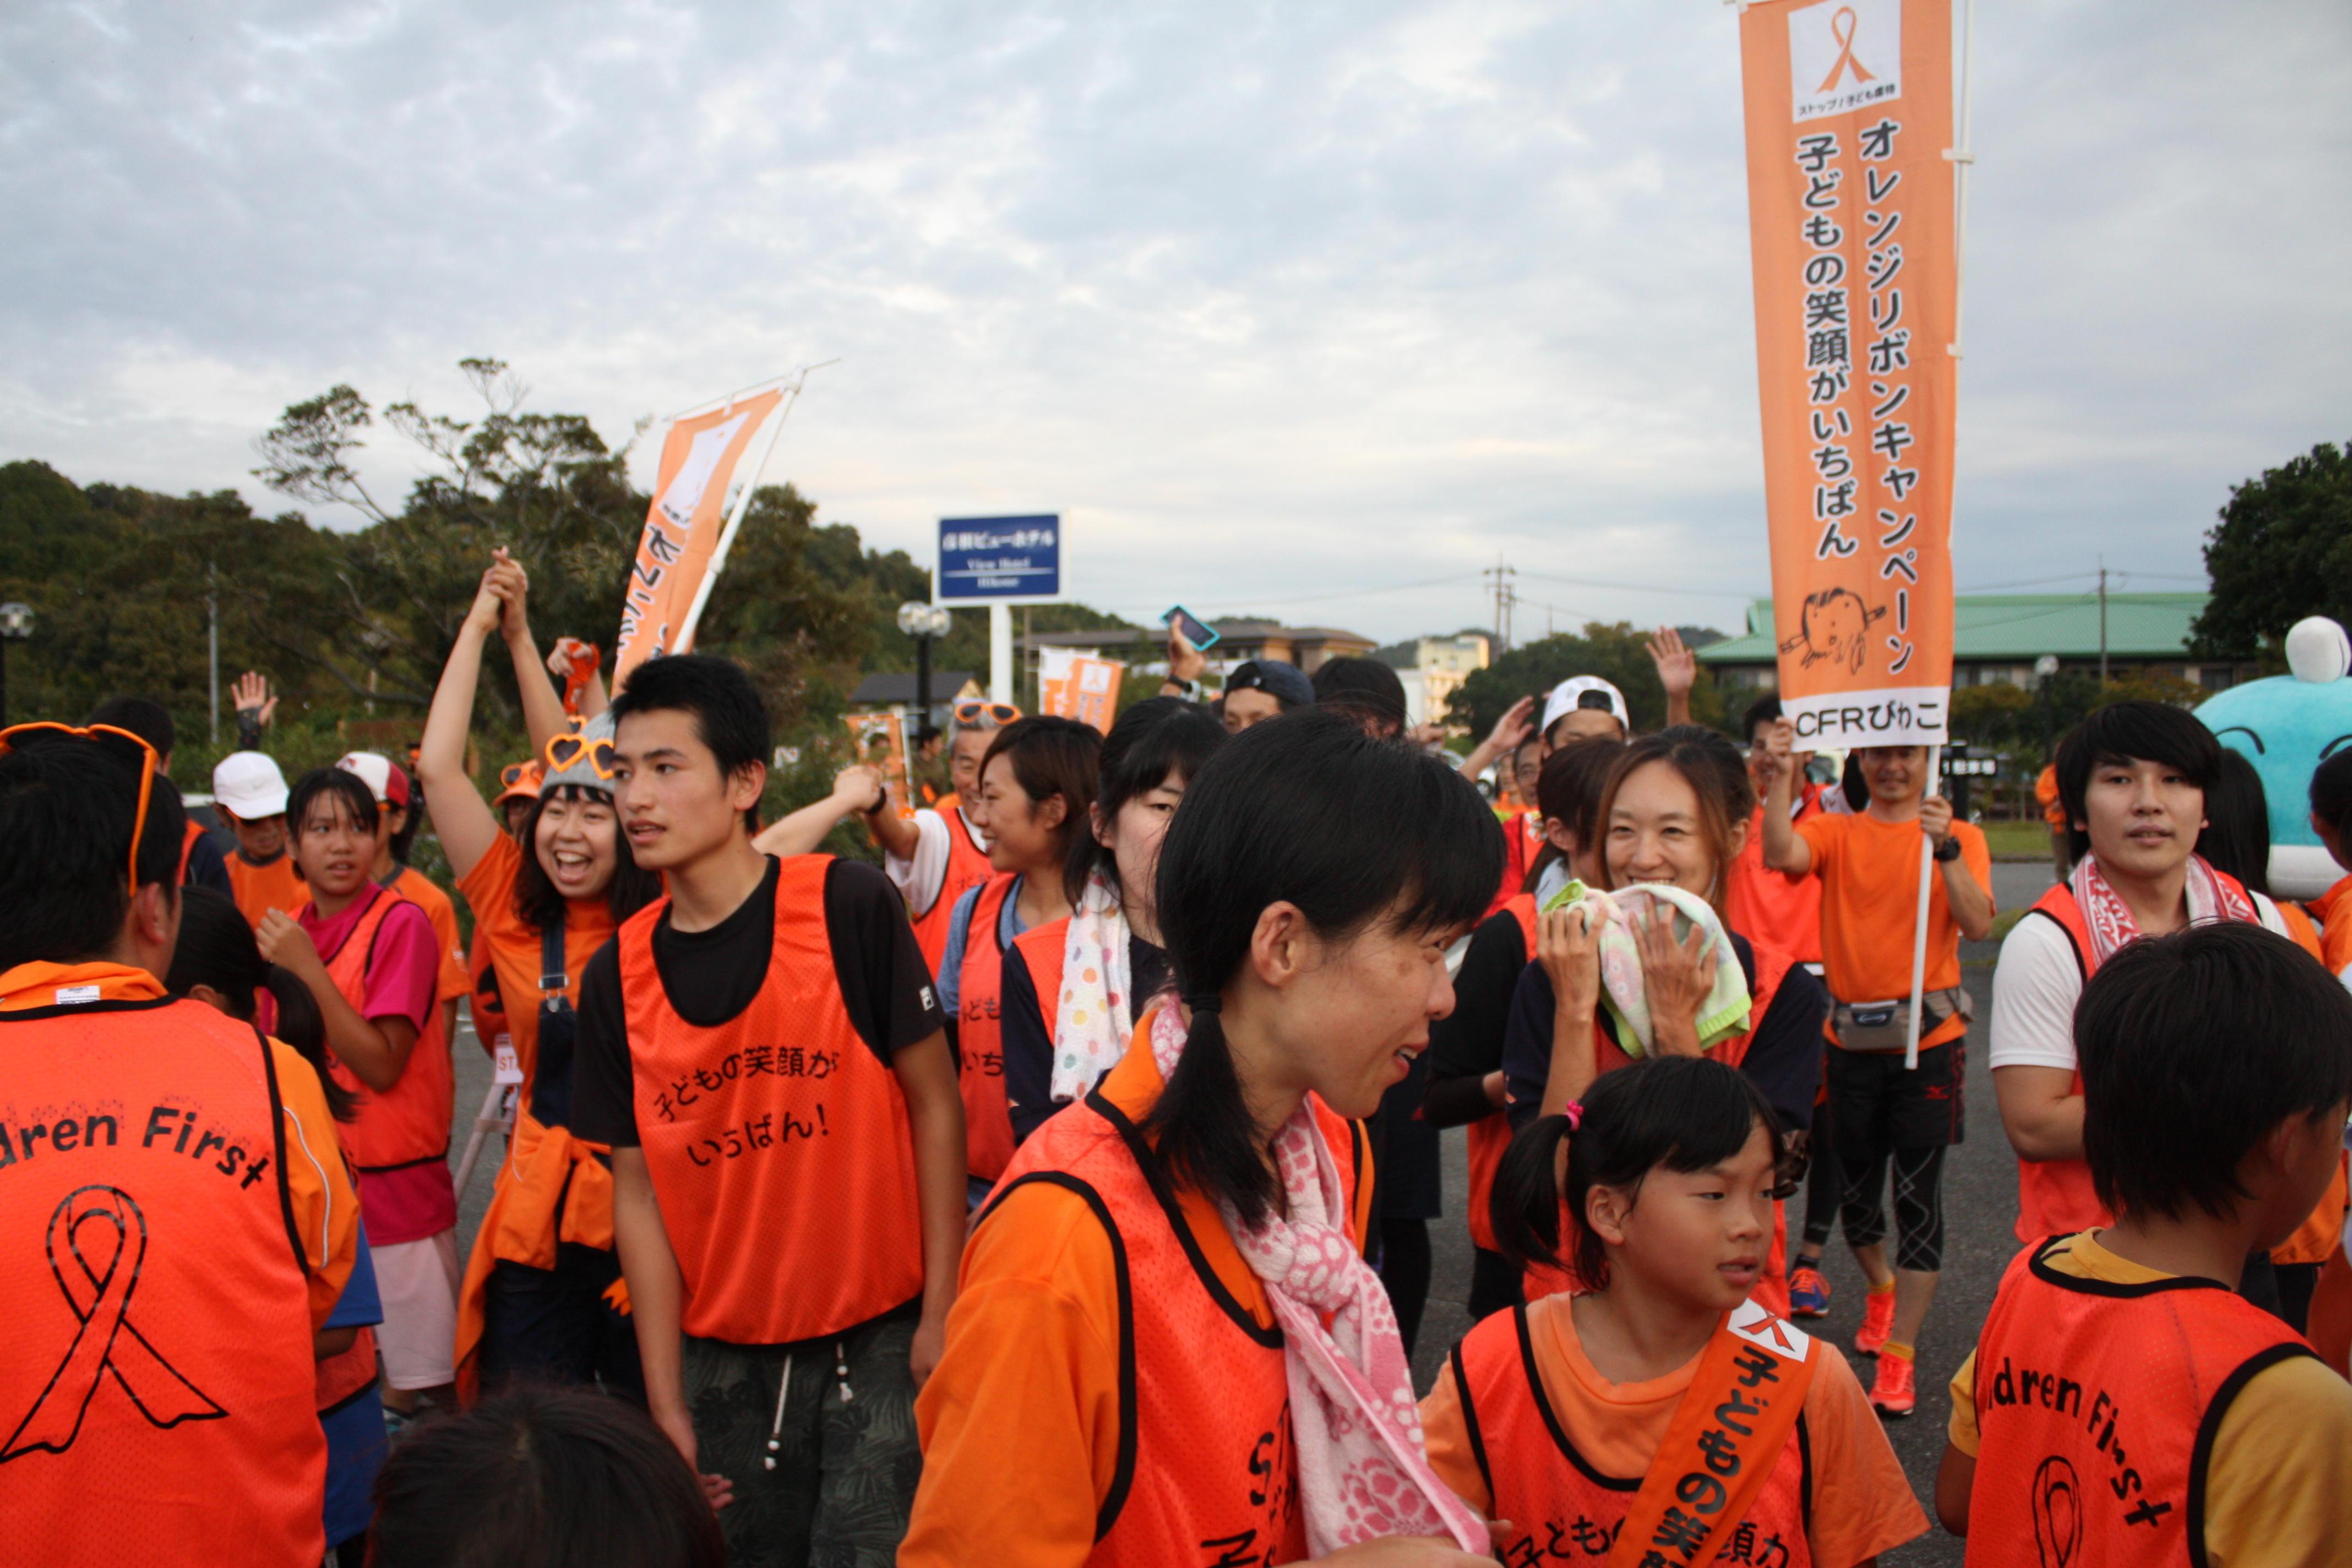 http://www.orangeribbon.jp/info/organization/IMG_2656.JPG